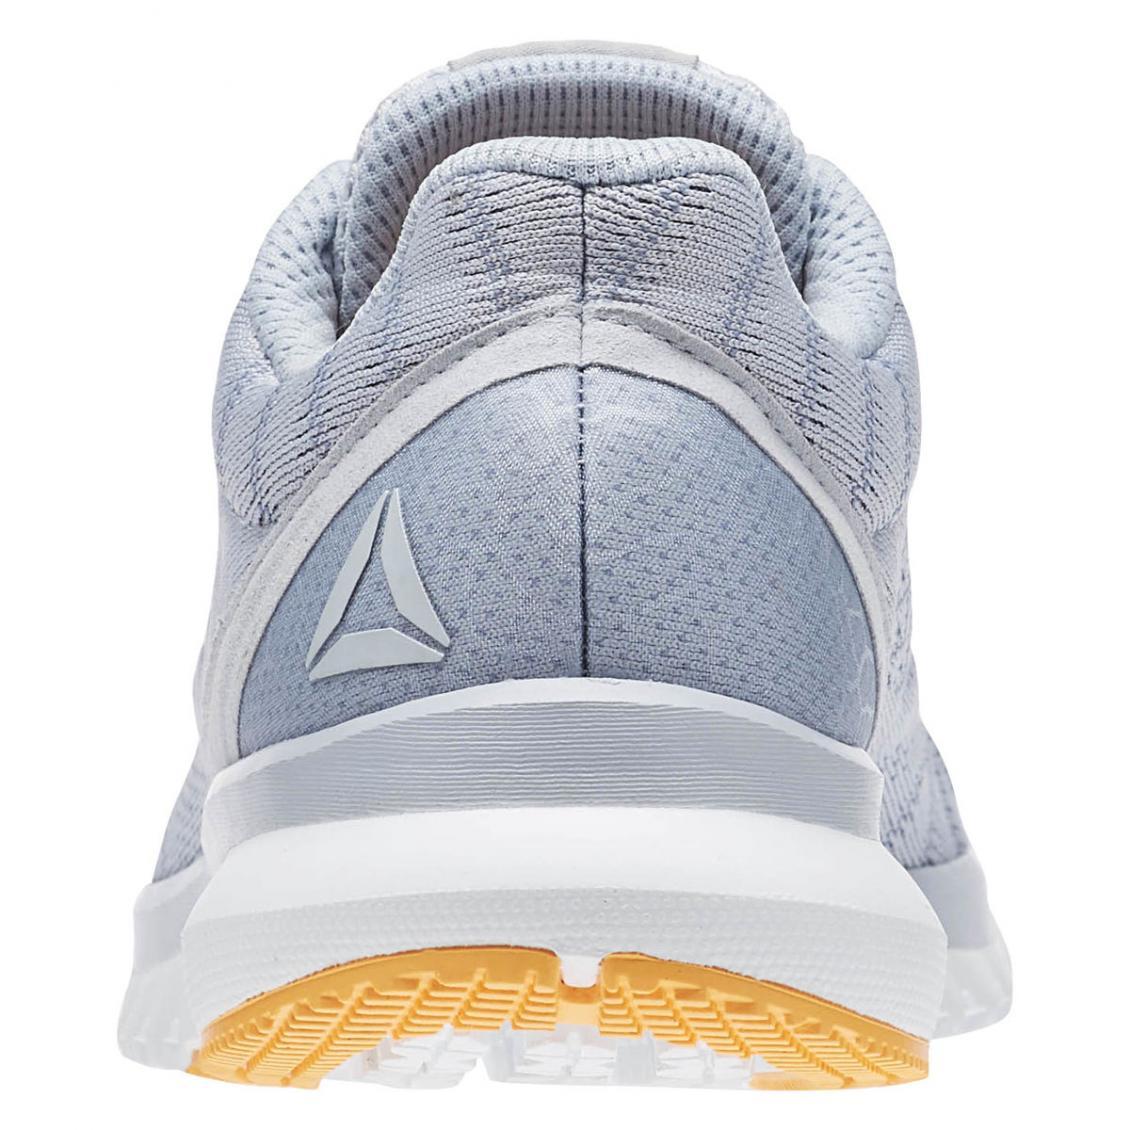 Grey – Reebok Print Smooth Ultraknit Womens Classic Grey / Asteroid Dust / Polar Blue / Black / Gable Grey